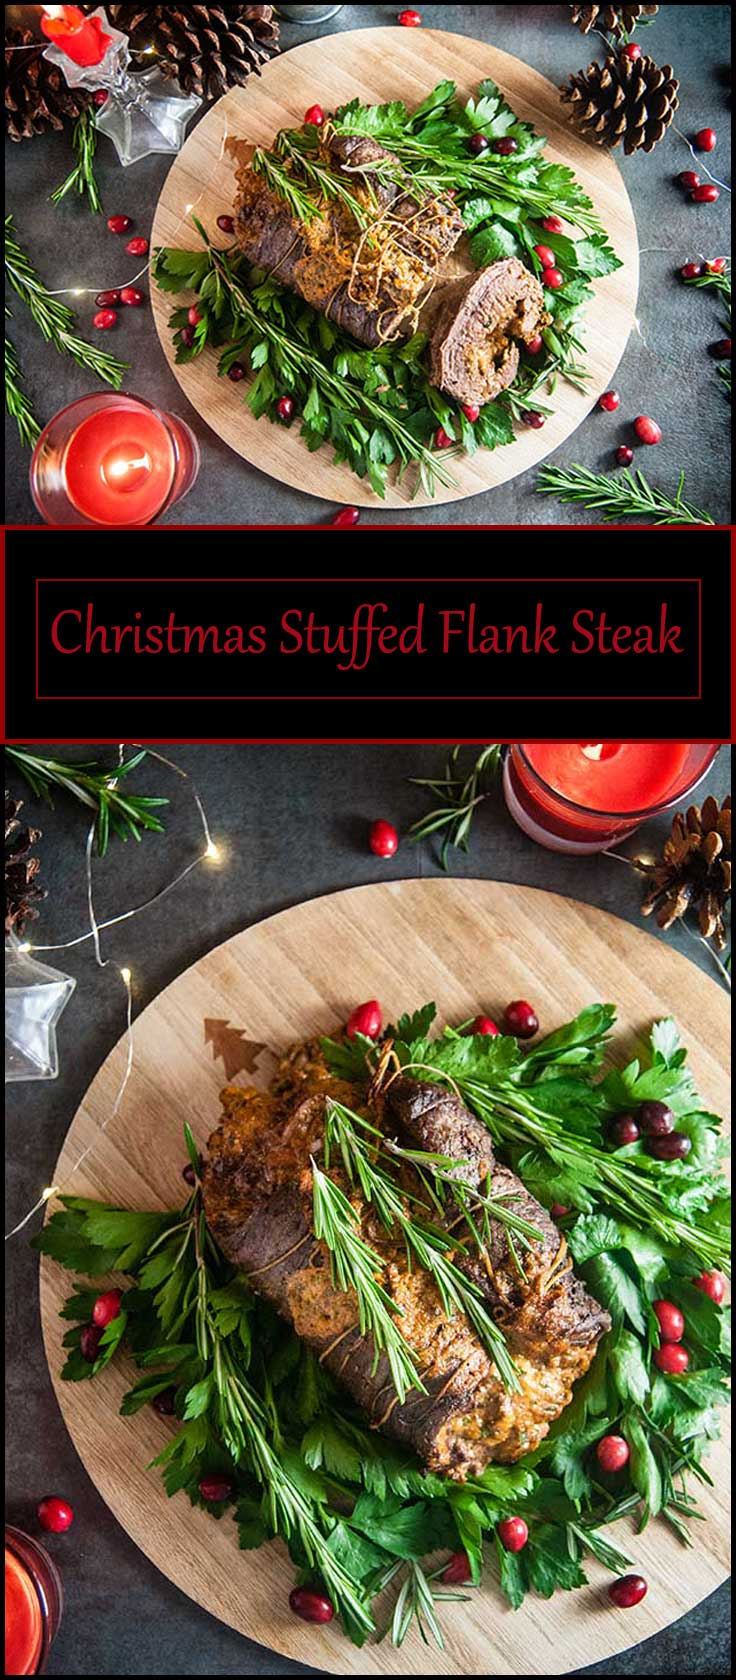 Christmas Stuffed Flank Steak from www.seasonedsprinkles.com